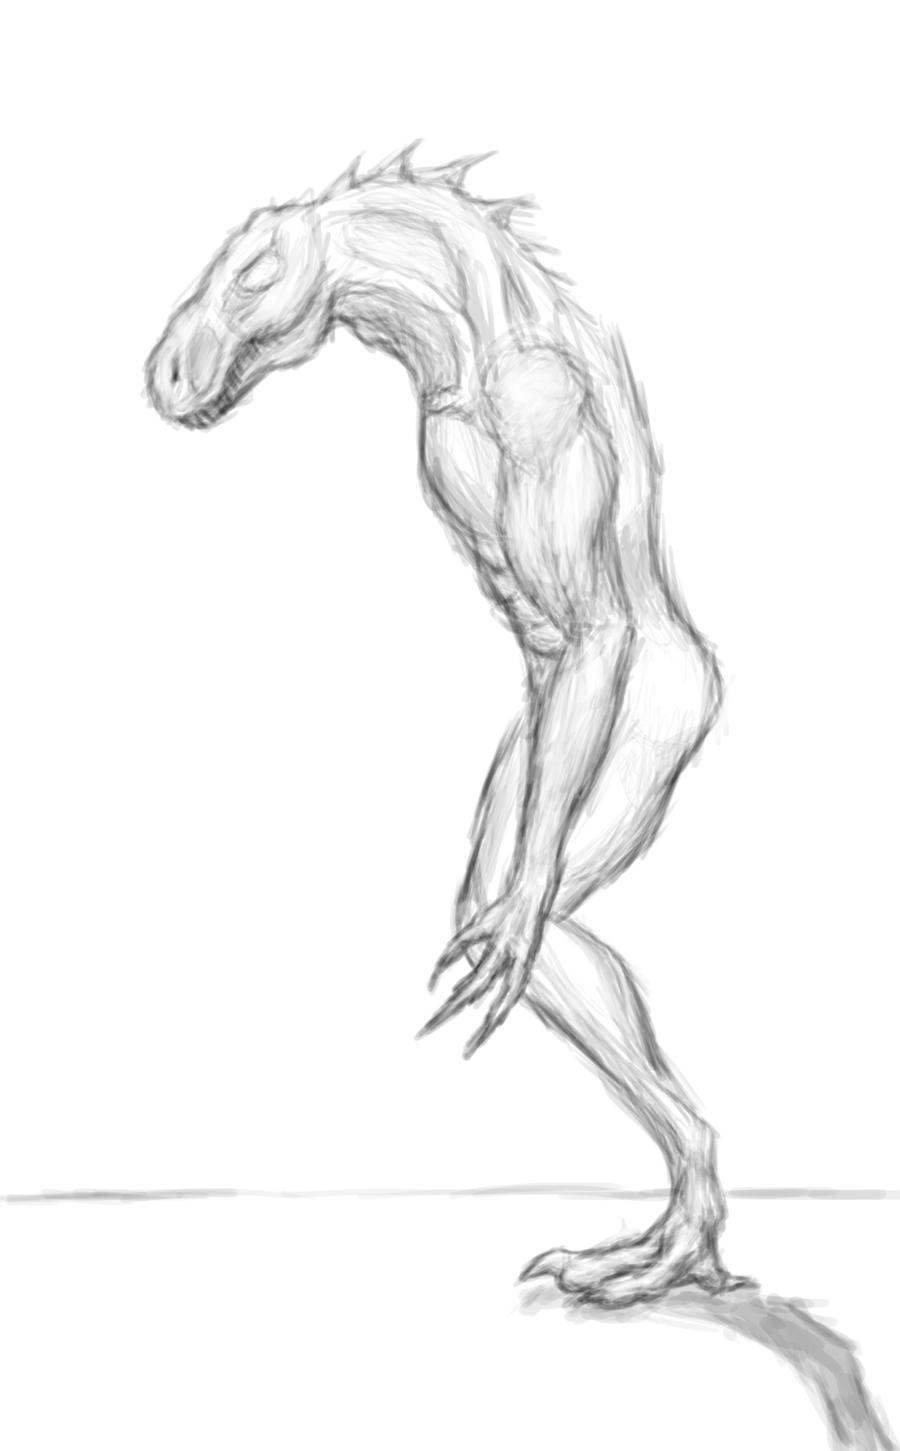 Rough Practice Sketch - Lizard/Human Anatomy by Zicorth on DeviantArt